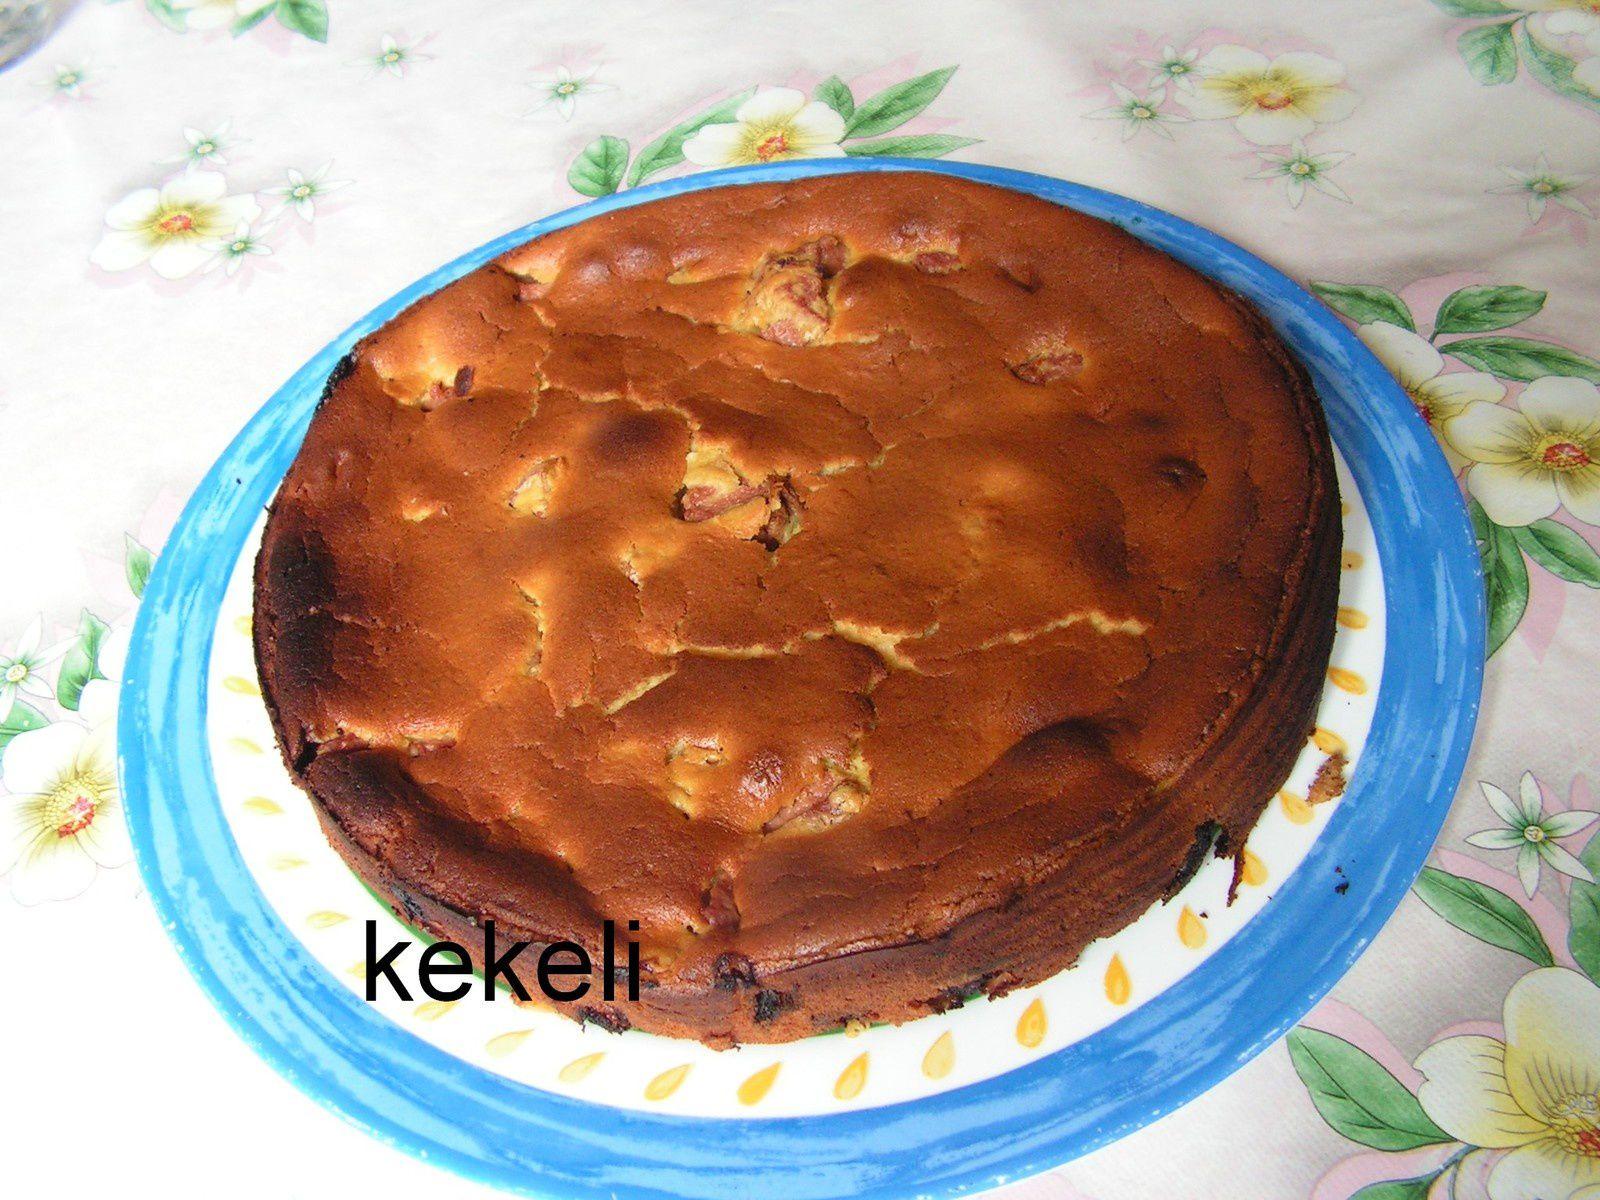 Gâteau aux coings